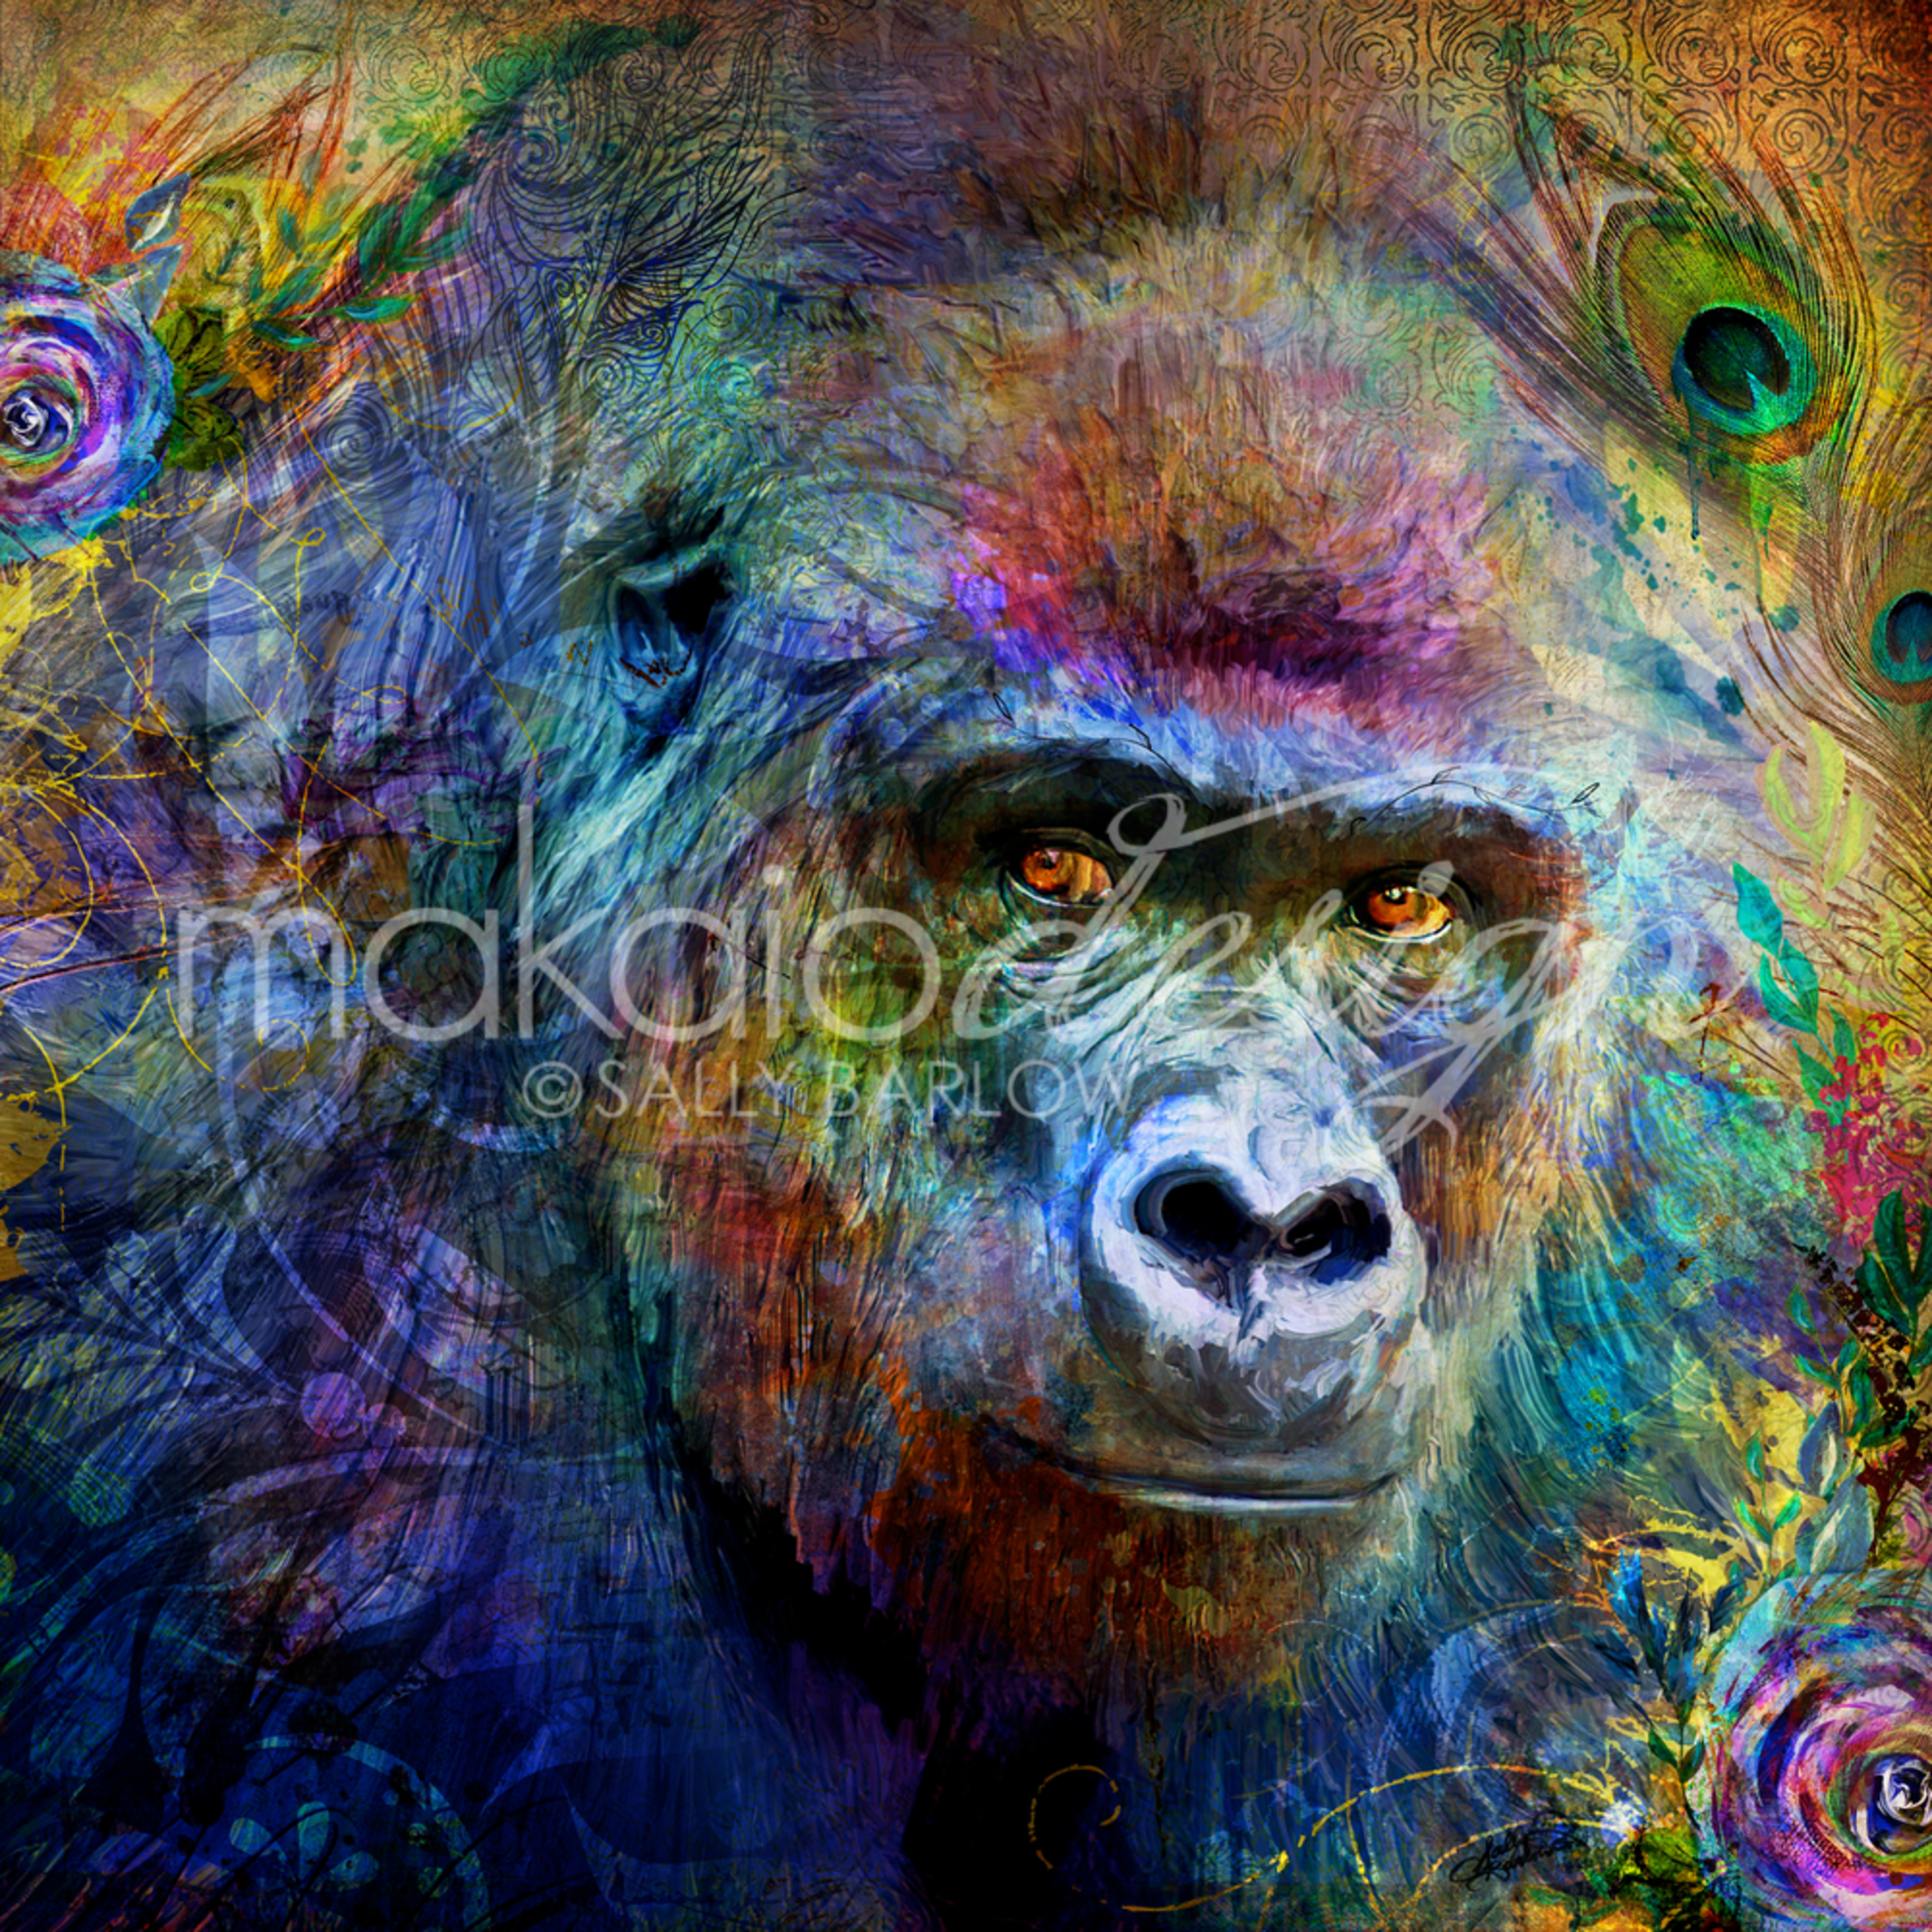 Gorillasquare swy8ta